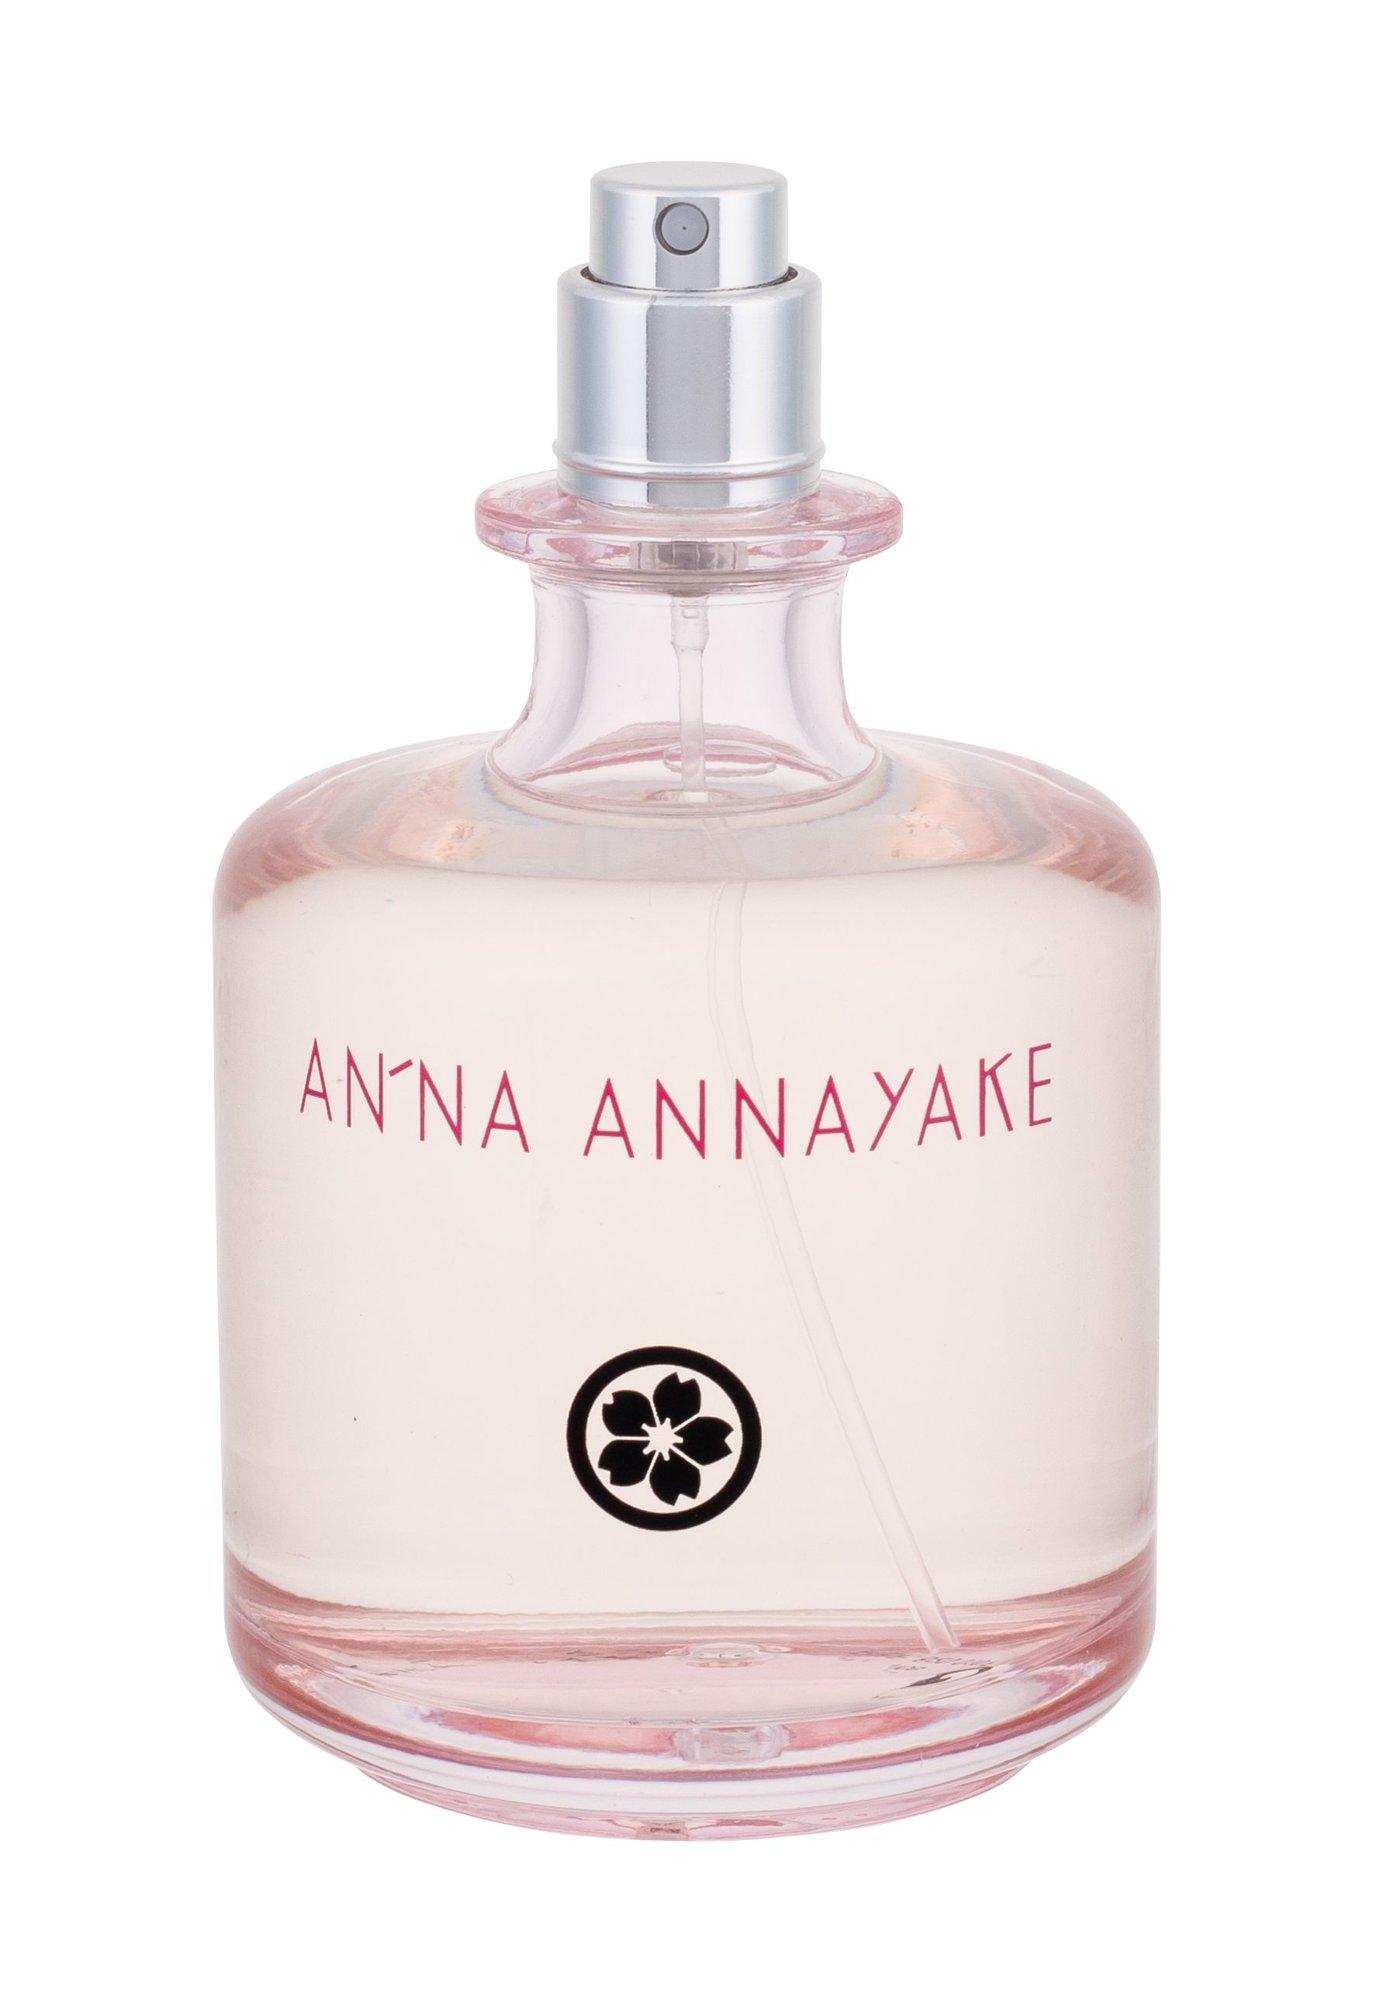 Annayake An´na Annayake EDP 100ml